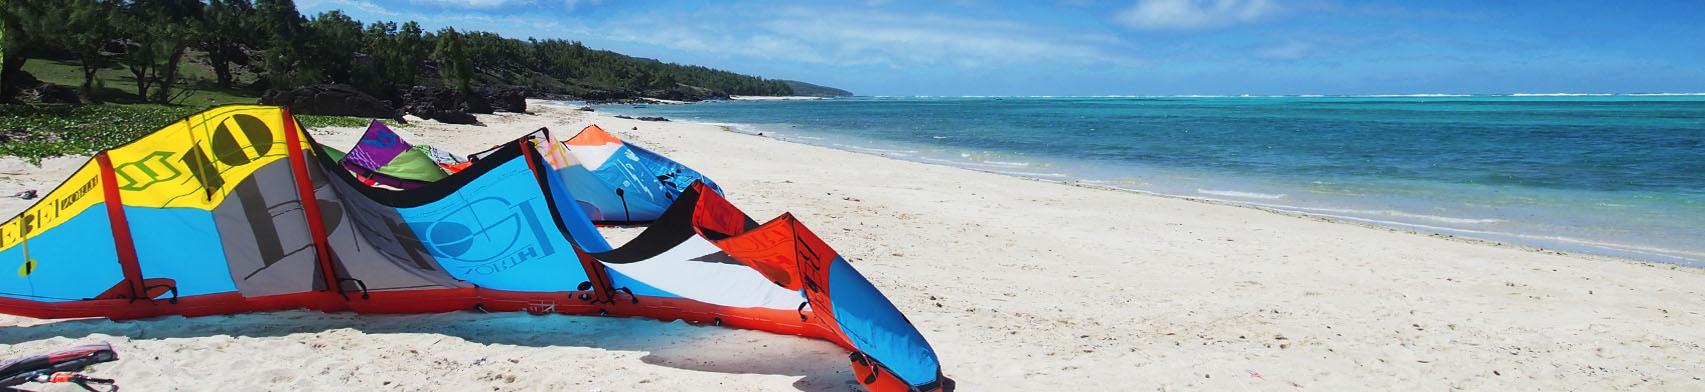 kite_beach_rodrigues